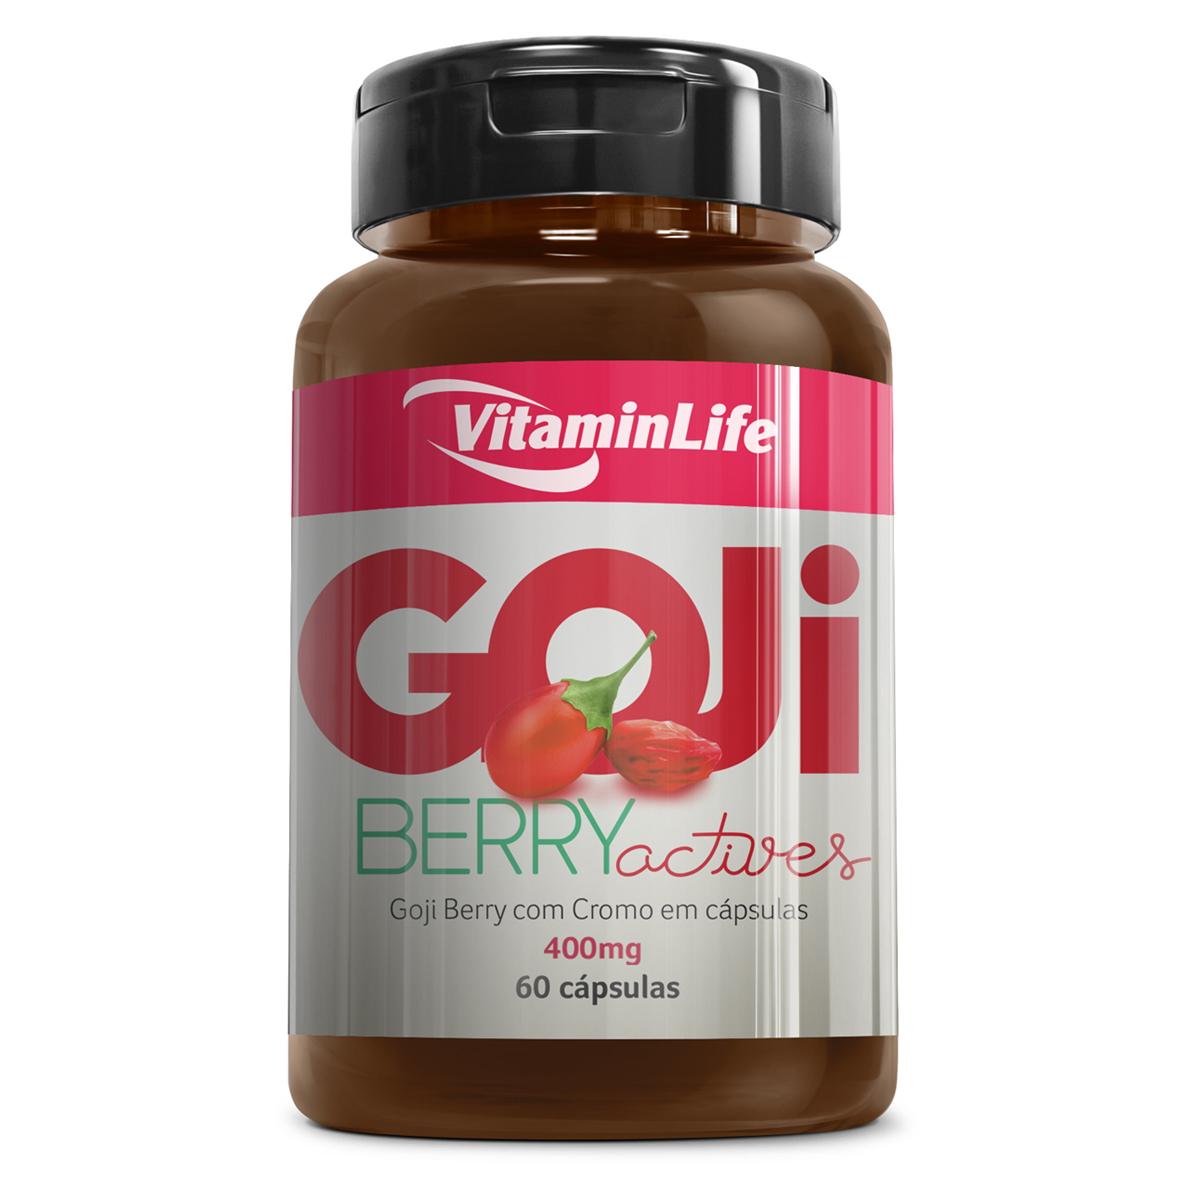 Goji Berry Actives 400mg 60 Cápsulas Vitaminlife 60 Cápsulas